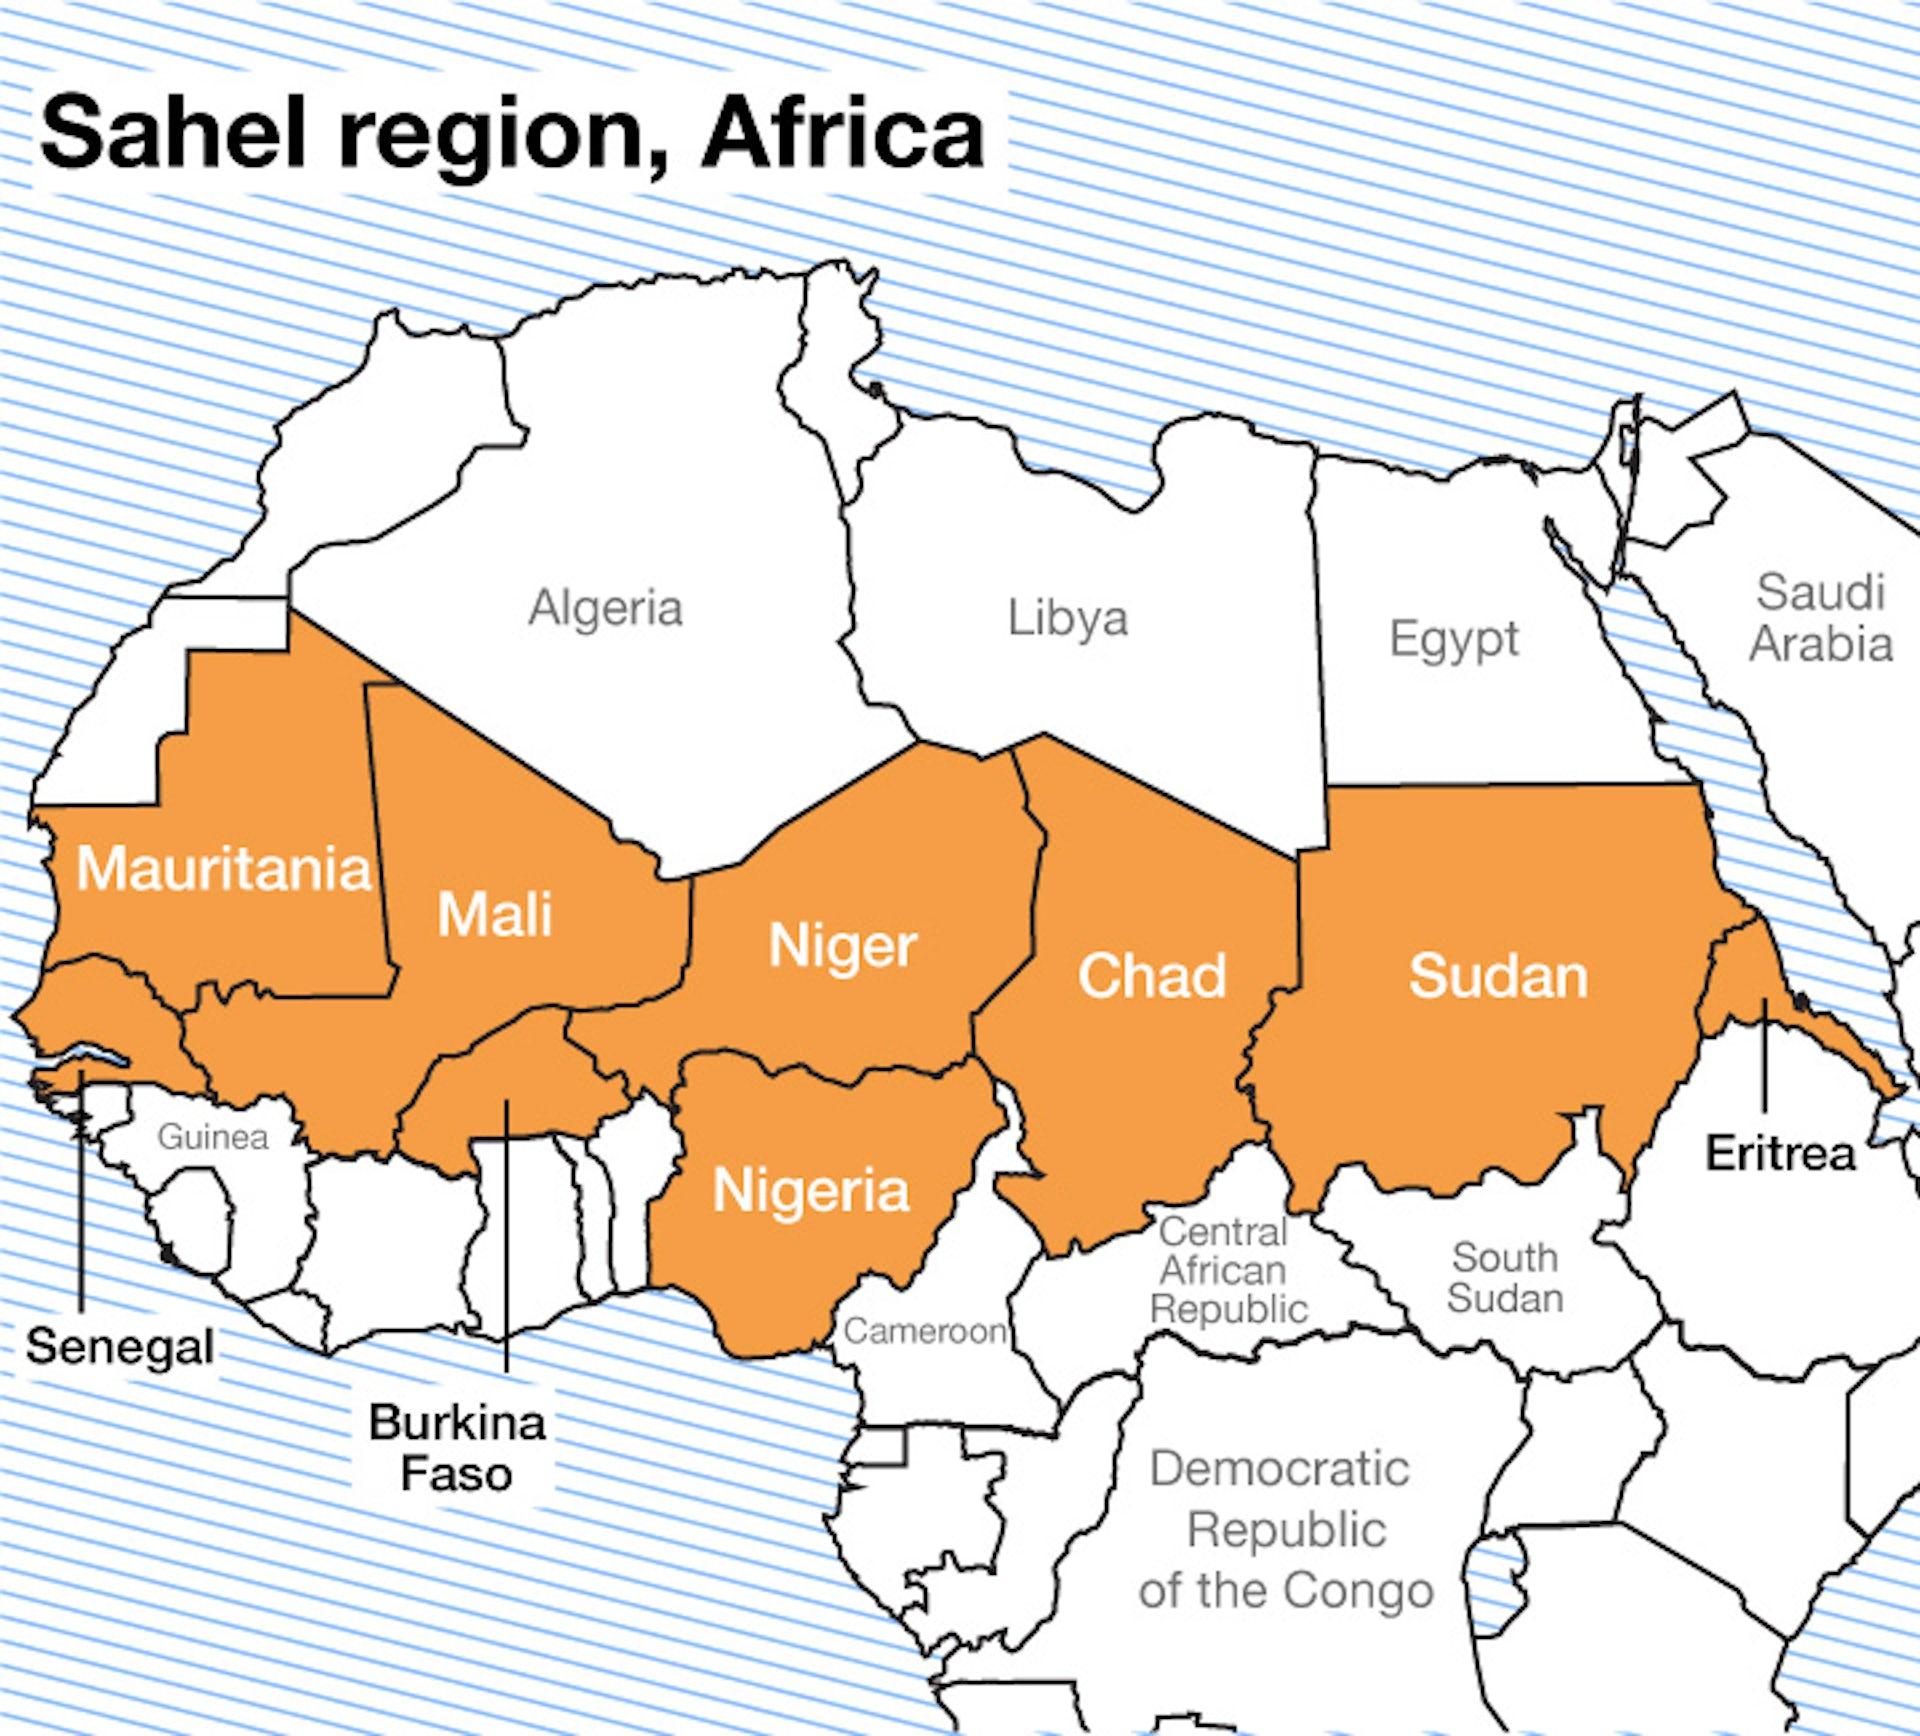 sahel in africa map